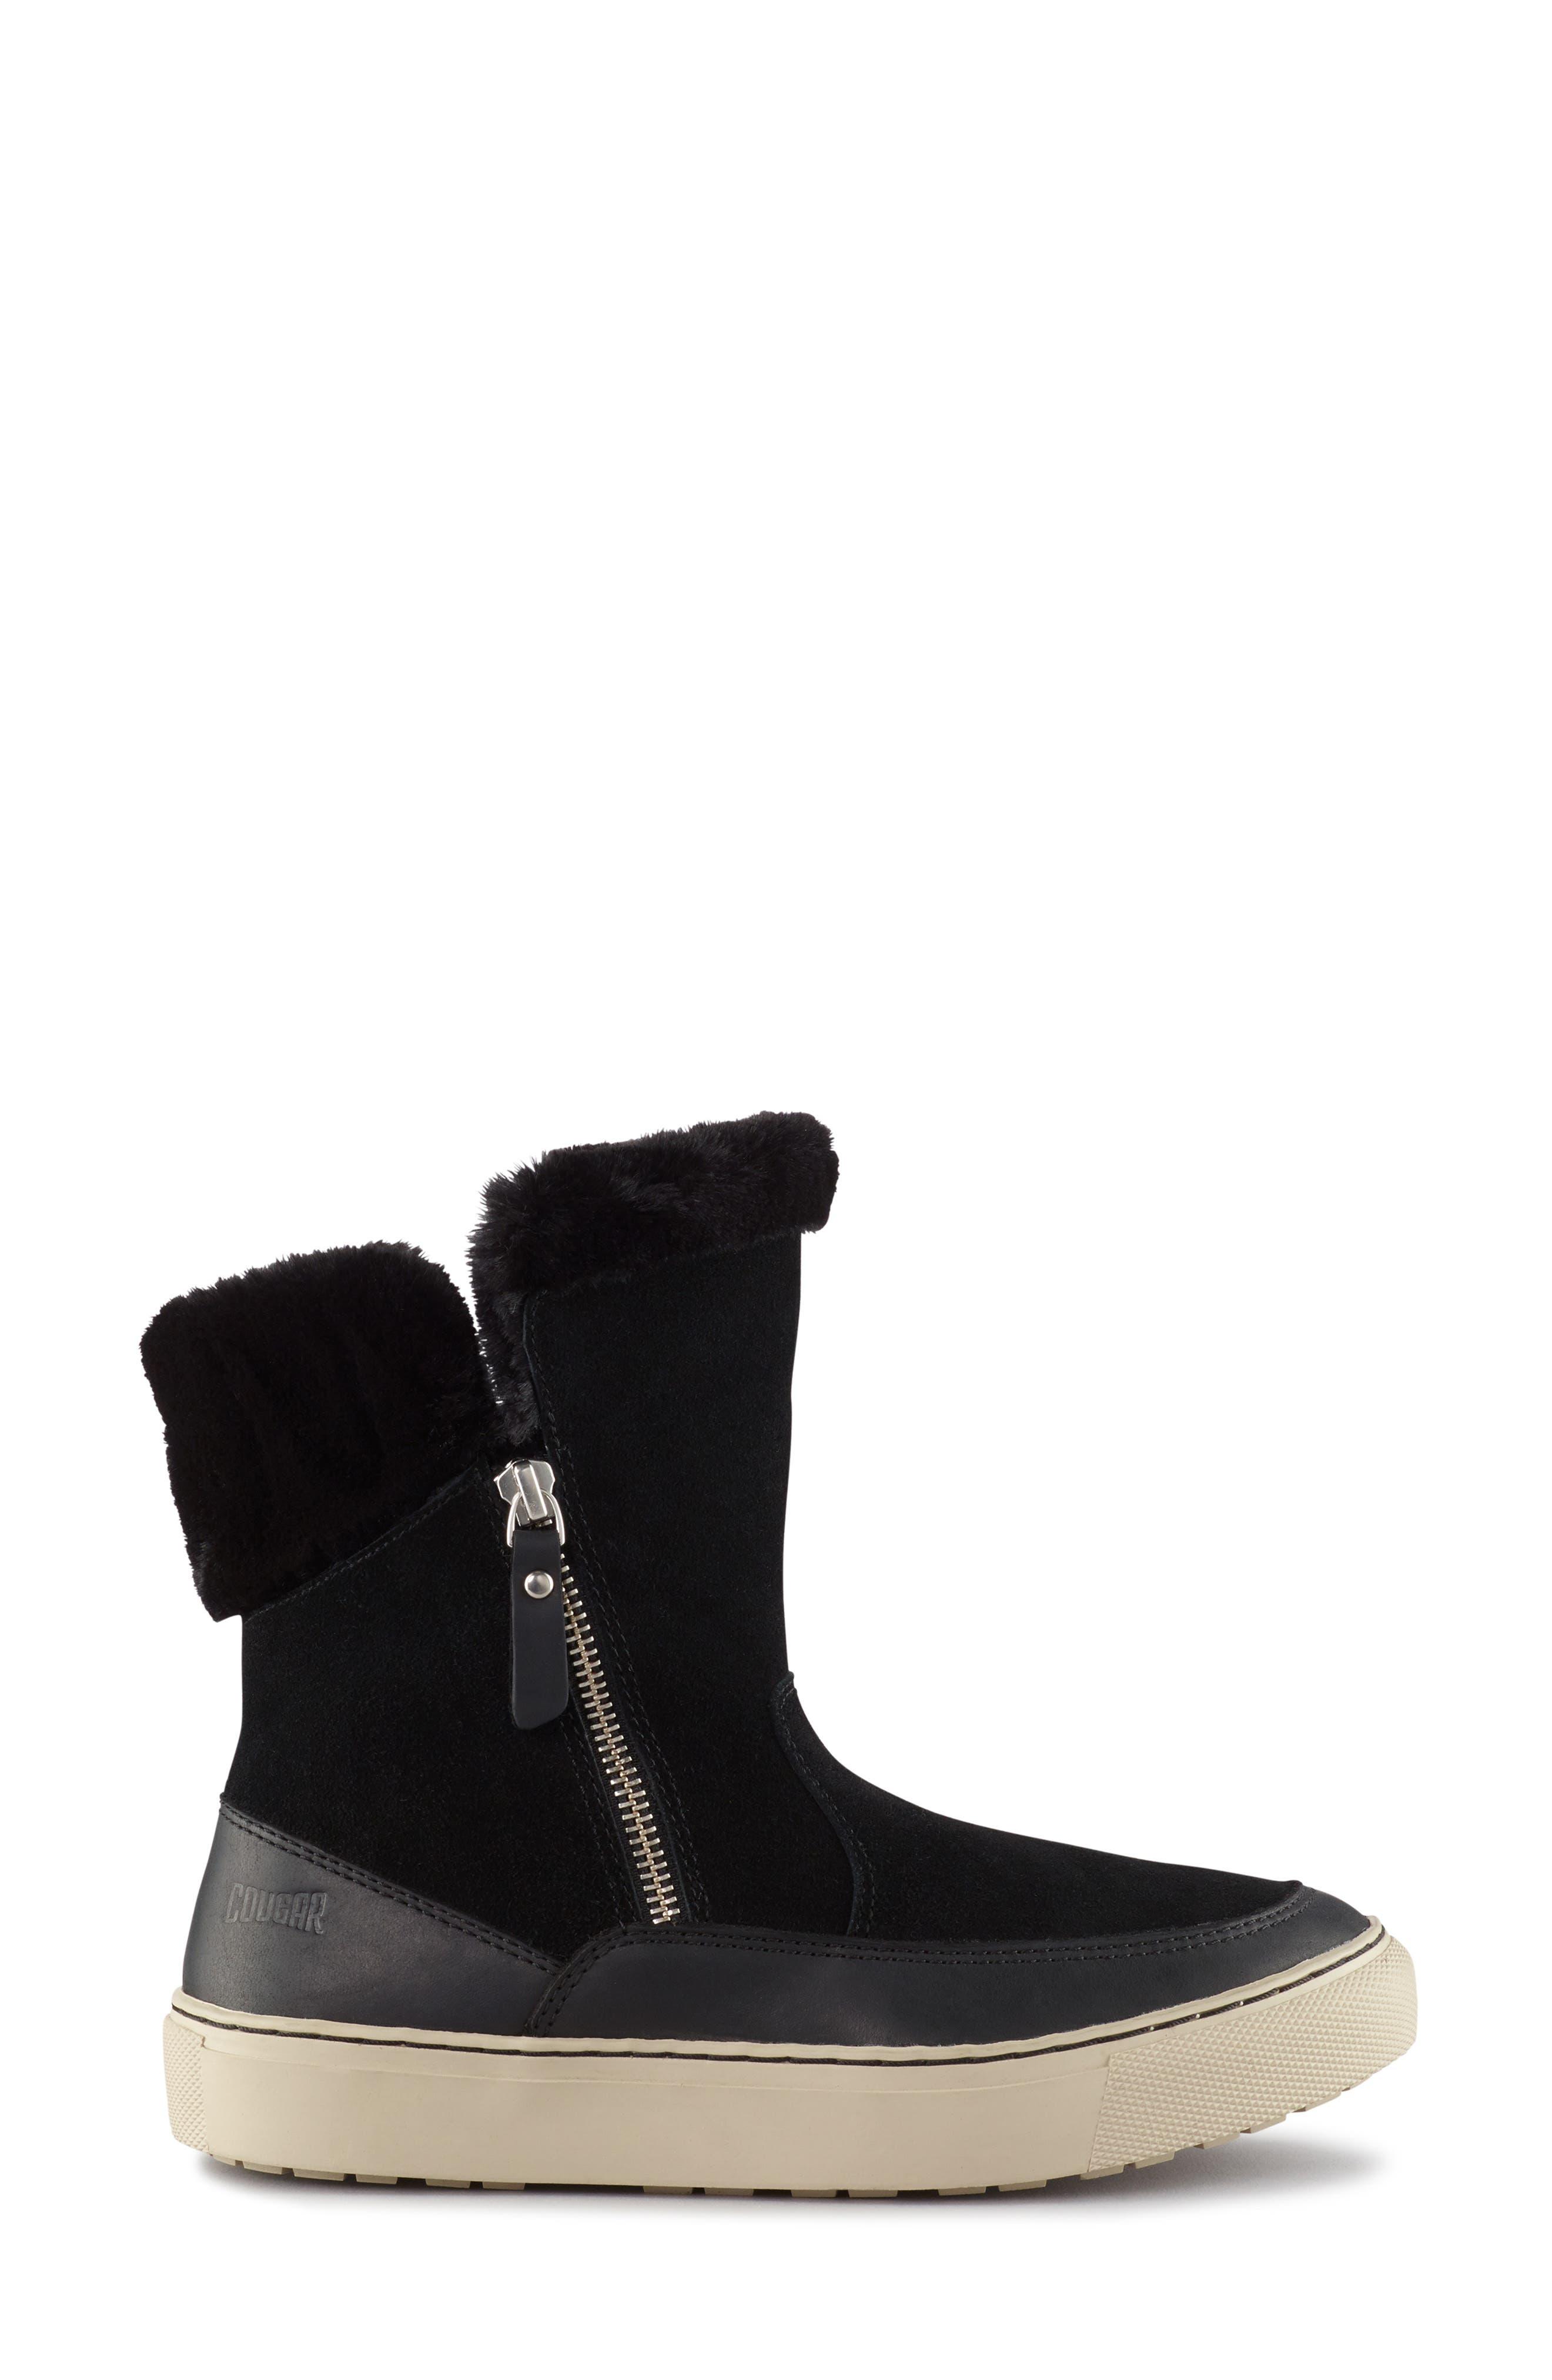 Dresden Waterproof Sneaker Boot with Faux Fur Trim,                             Alternate thumbnail 2, color,                             001